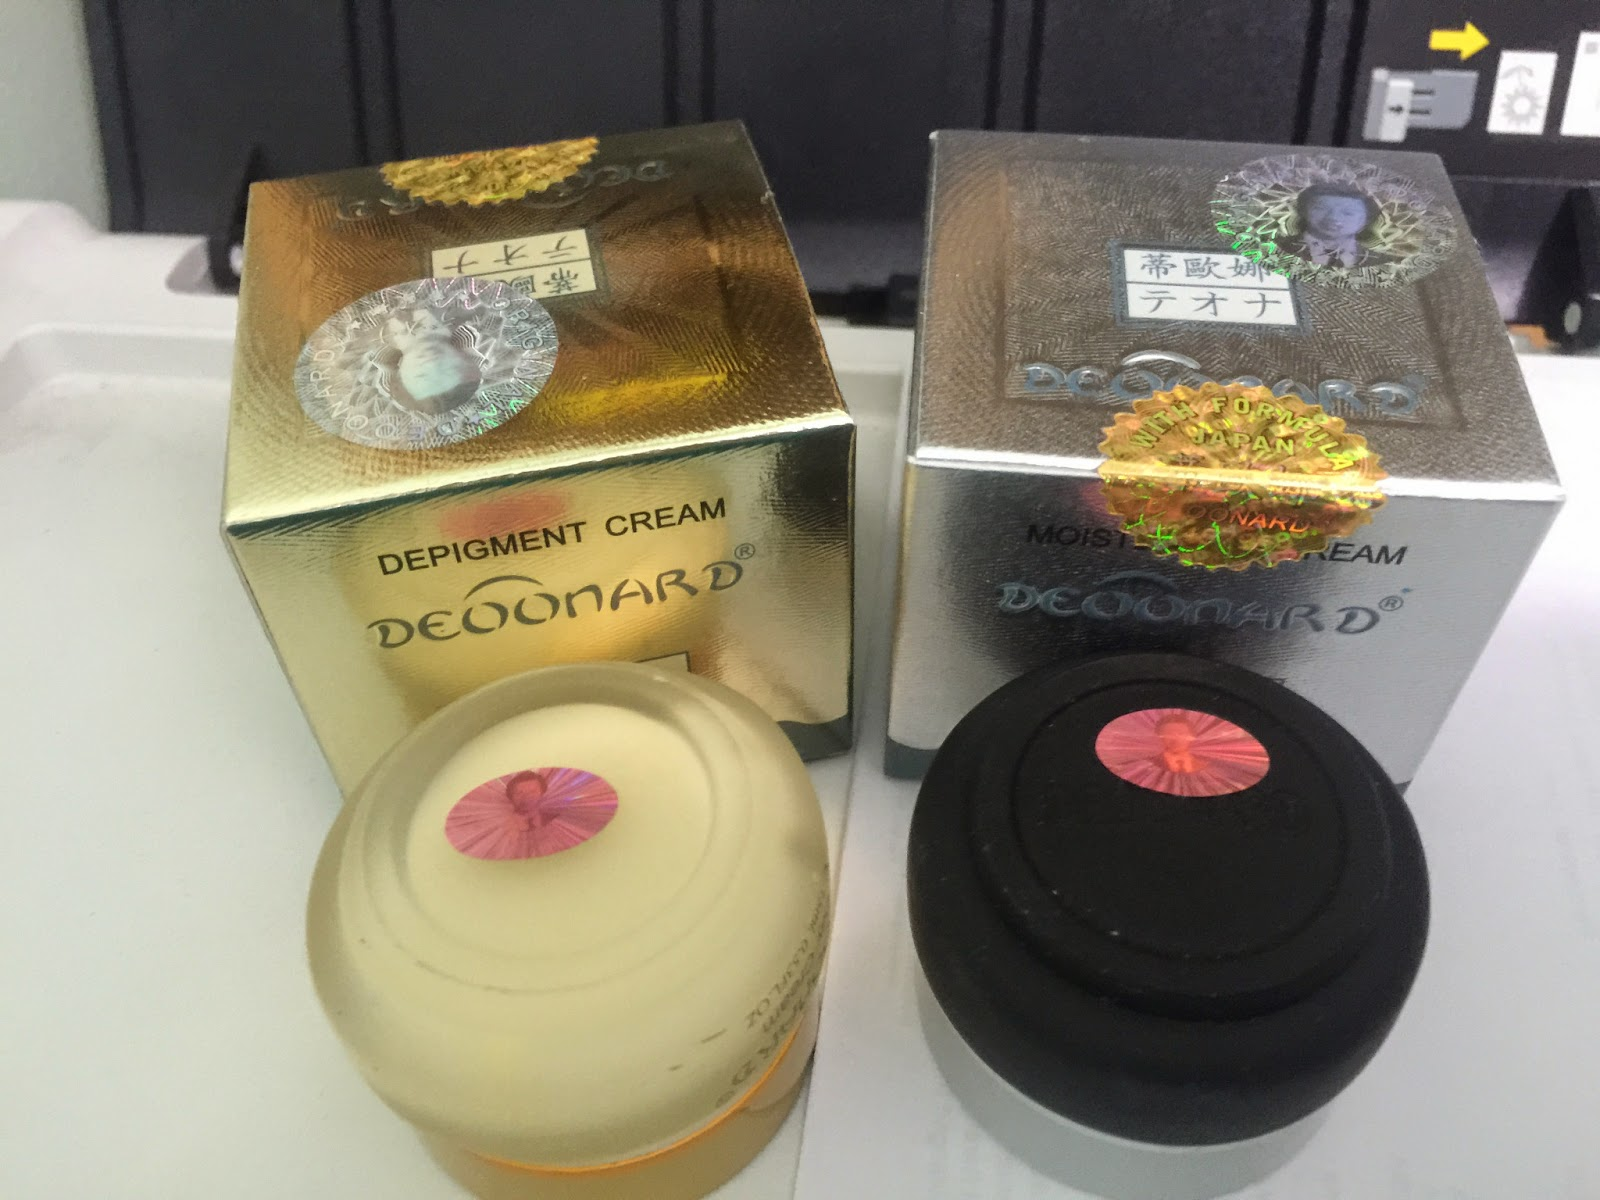 Deoonard Gold Silver Toko Online Kosmetik Night Cream Krim Malam Kemasan Terbaru Juni 2015